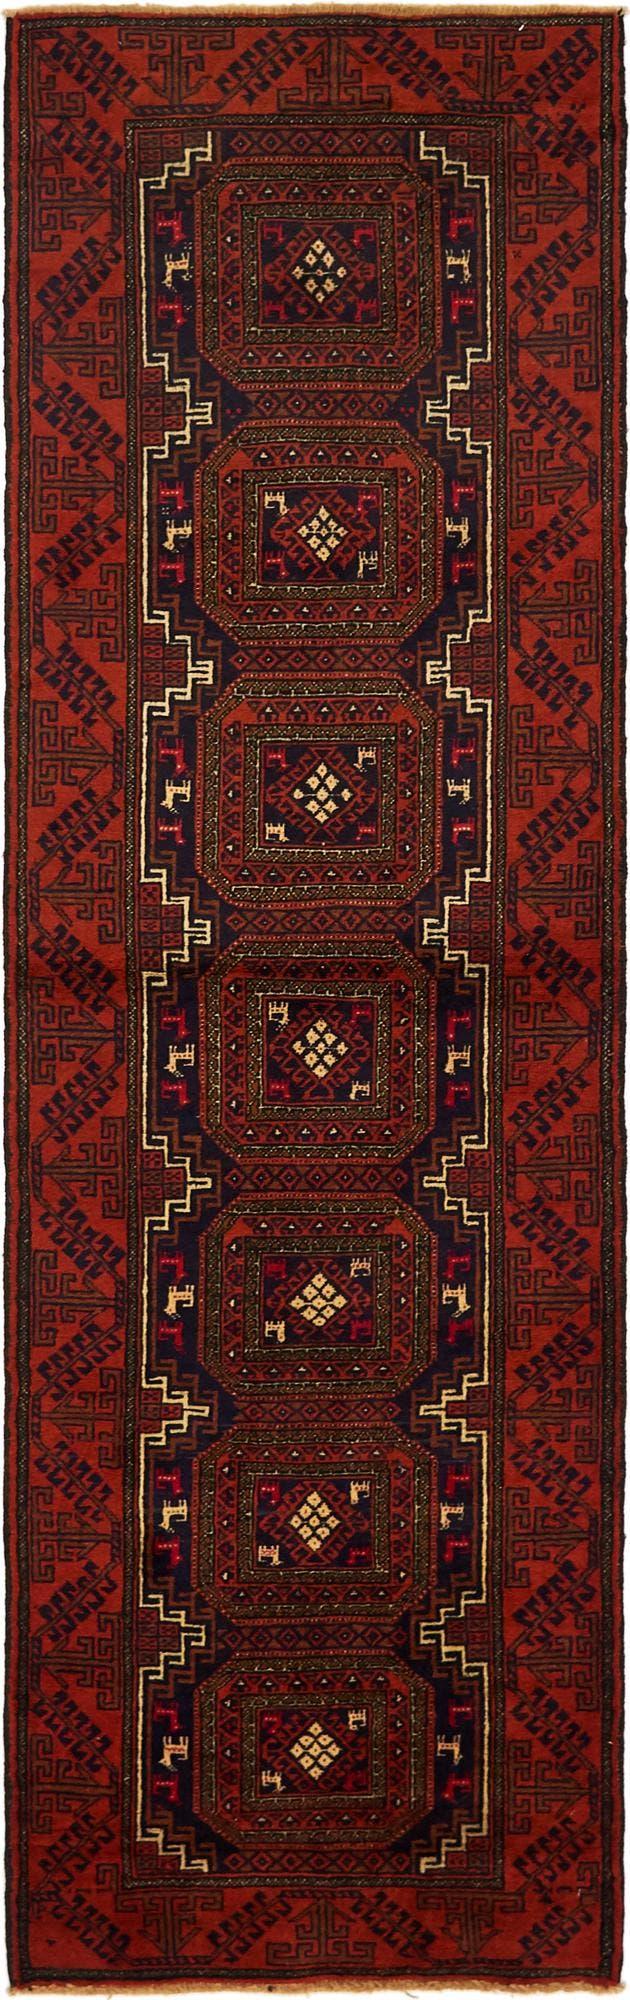 2' 8 x 9' 2 Balouch Persian Runner Rug main image